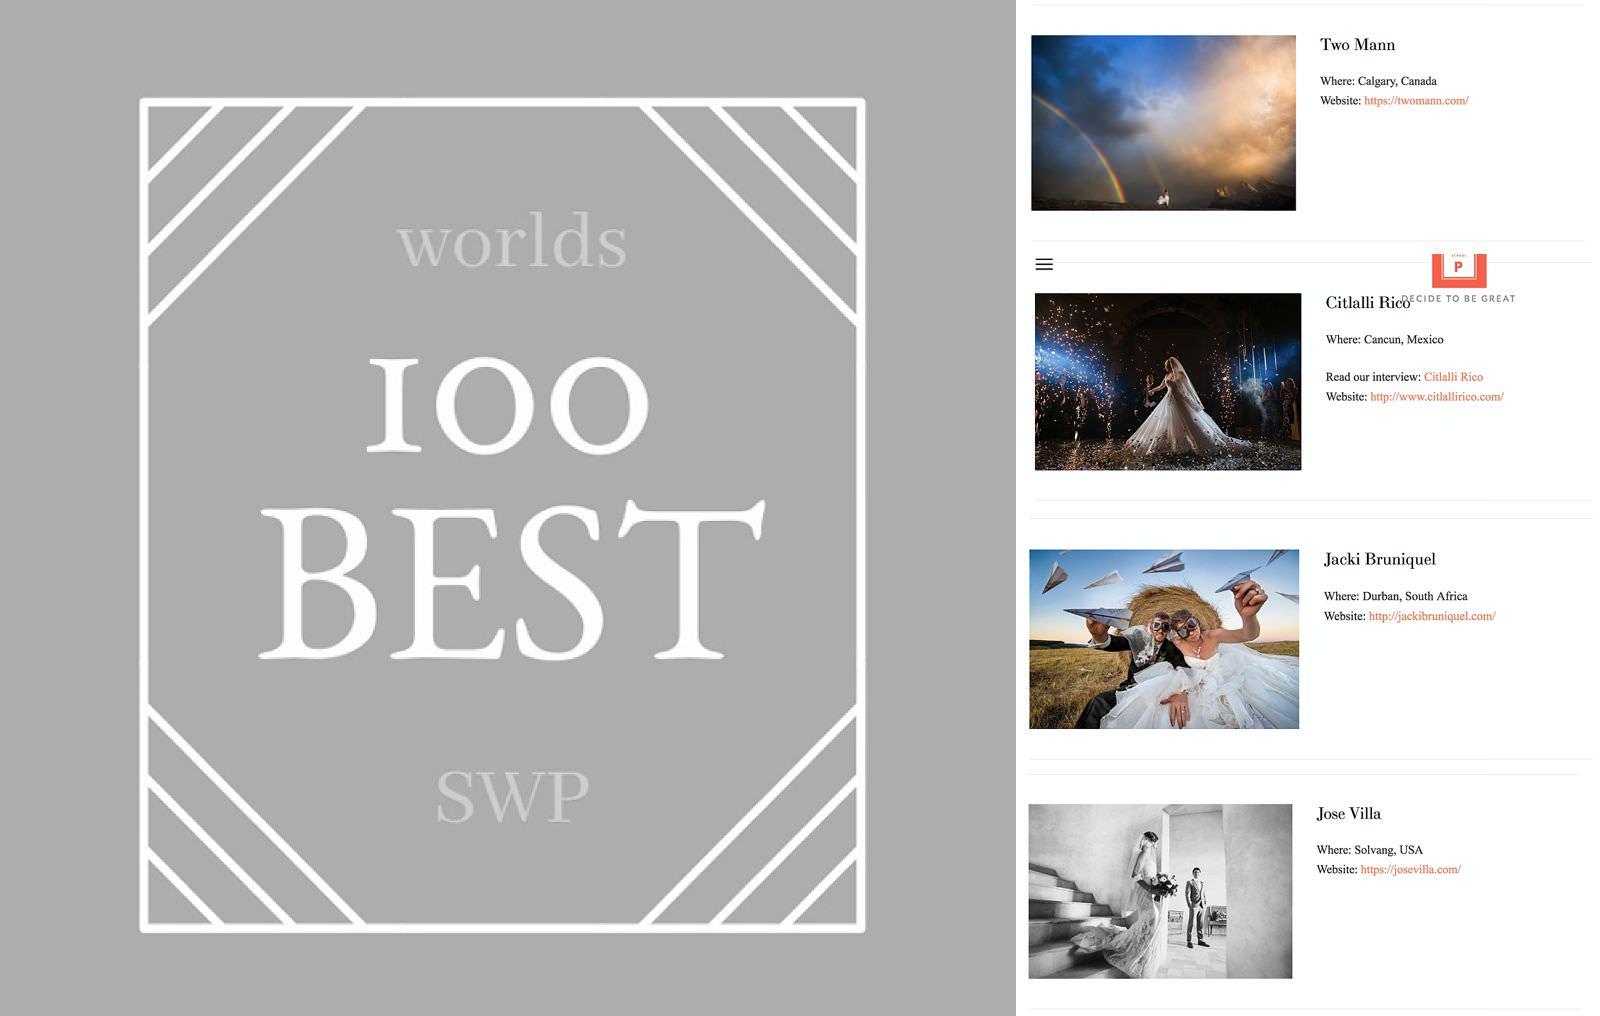 100 best wedding photographers in the world Jacki Bruniquel